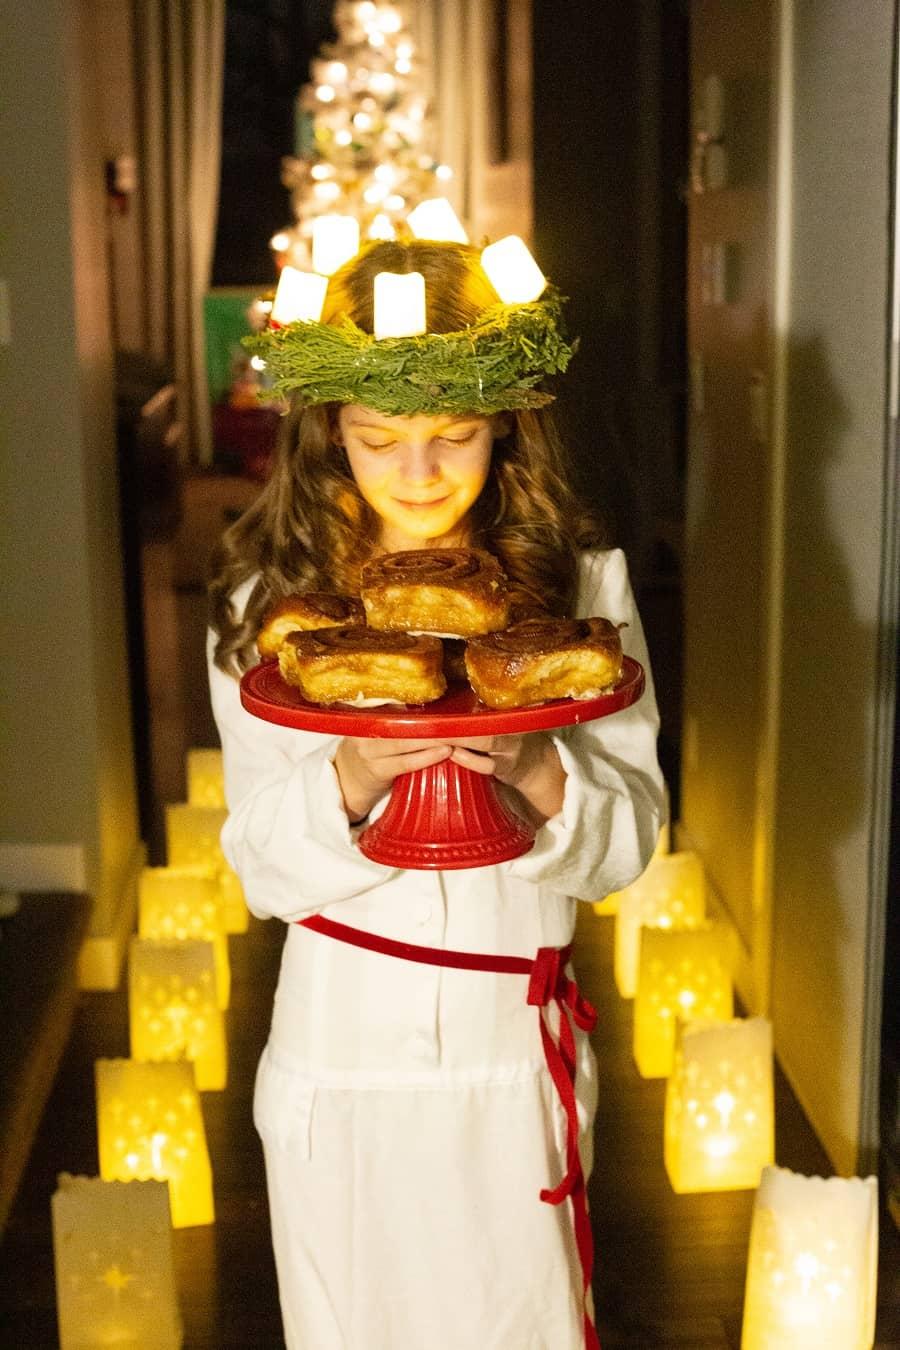 A girl in Swedish costume celebrating Santa Lucia day